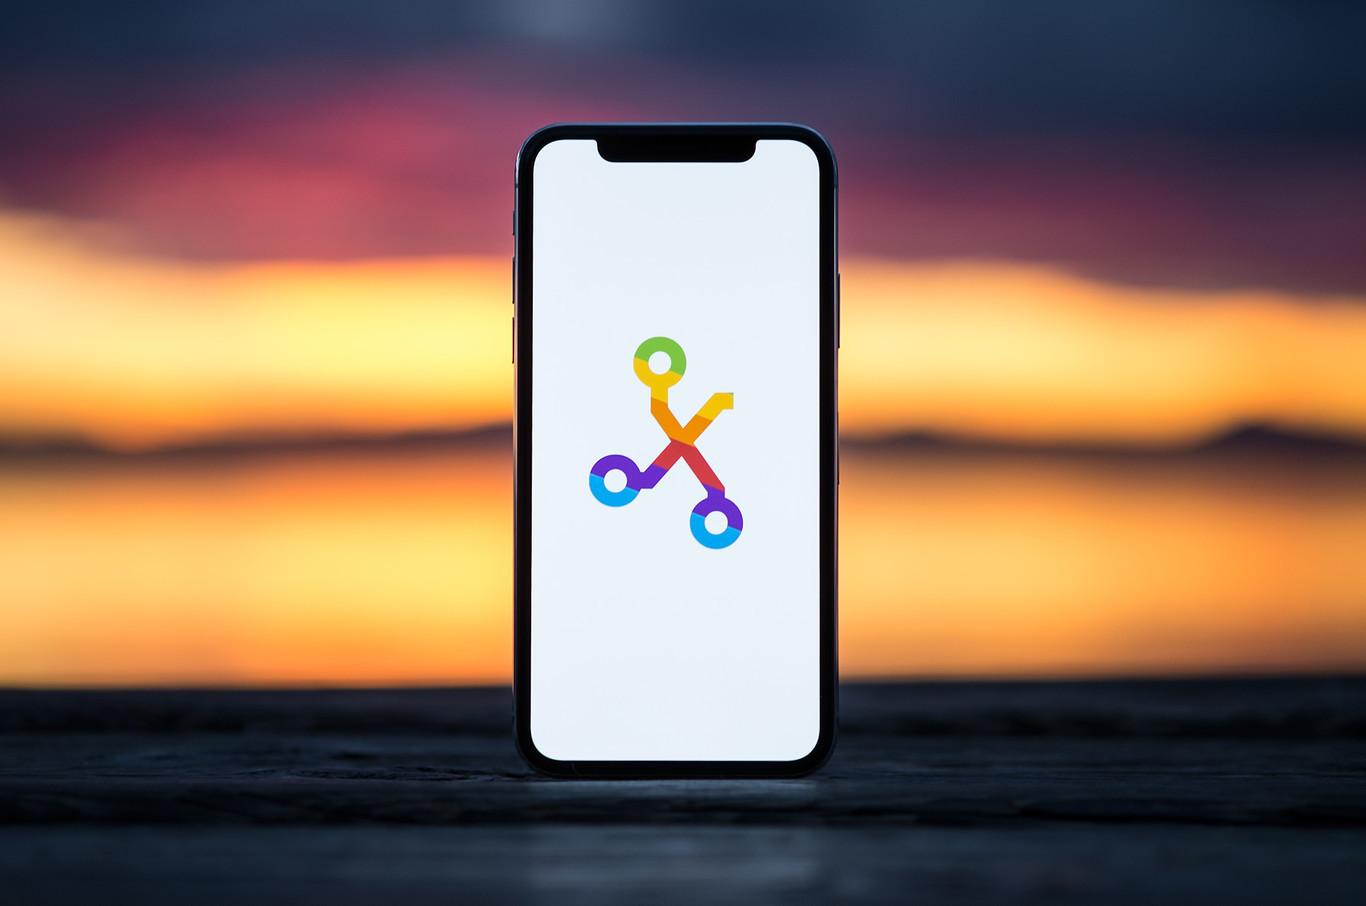 Oferta en Amazon: iPhone X de 256 GB por 899 euros